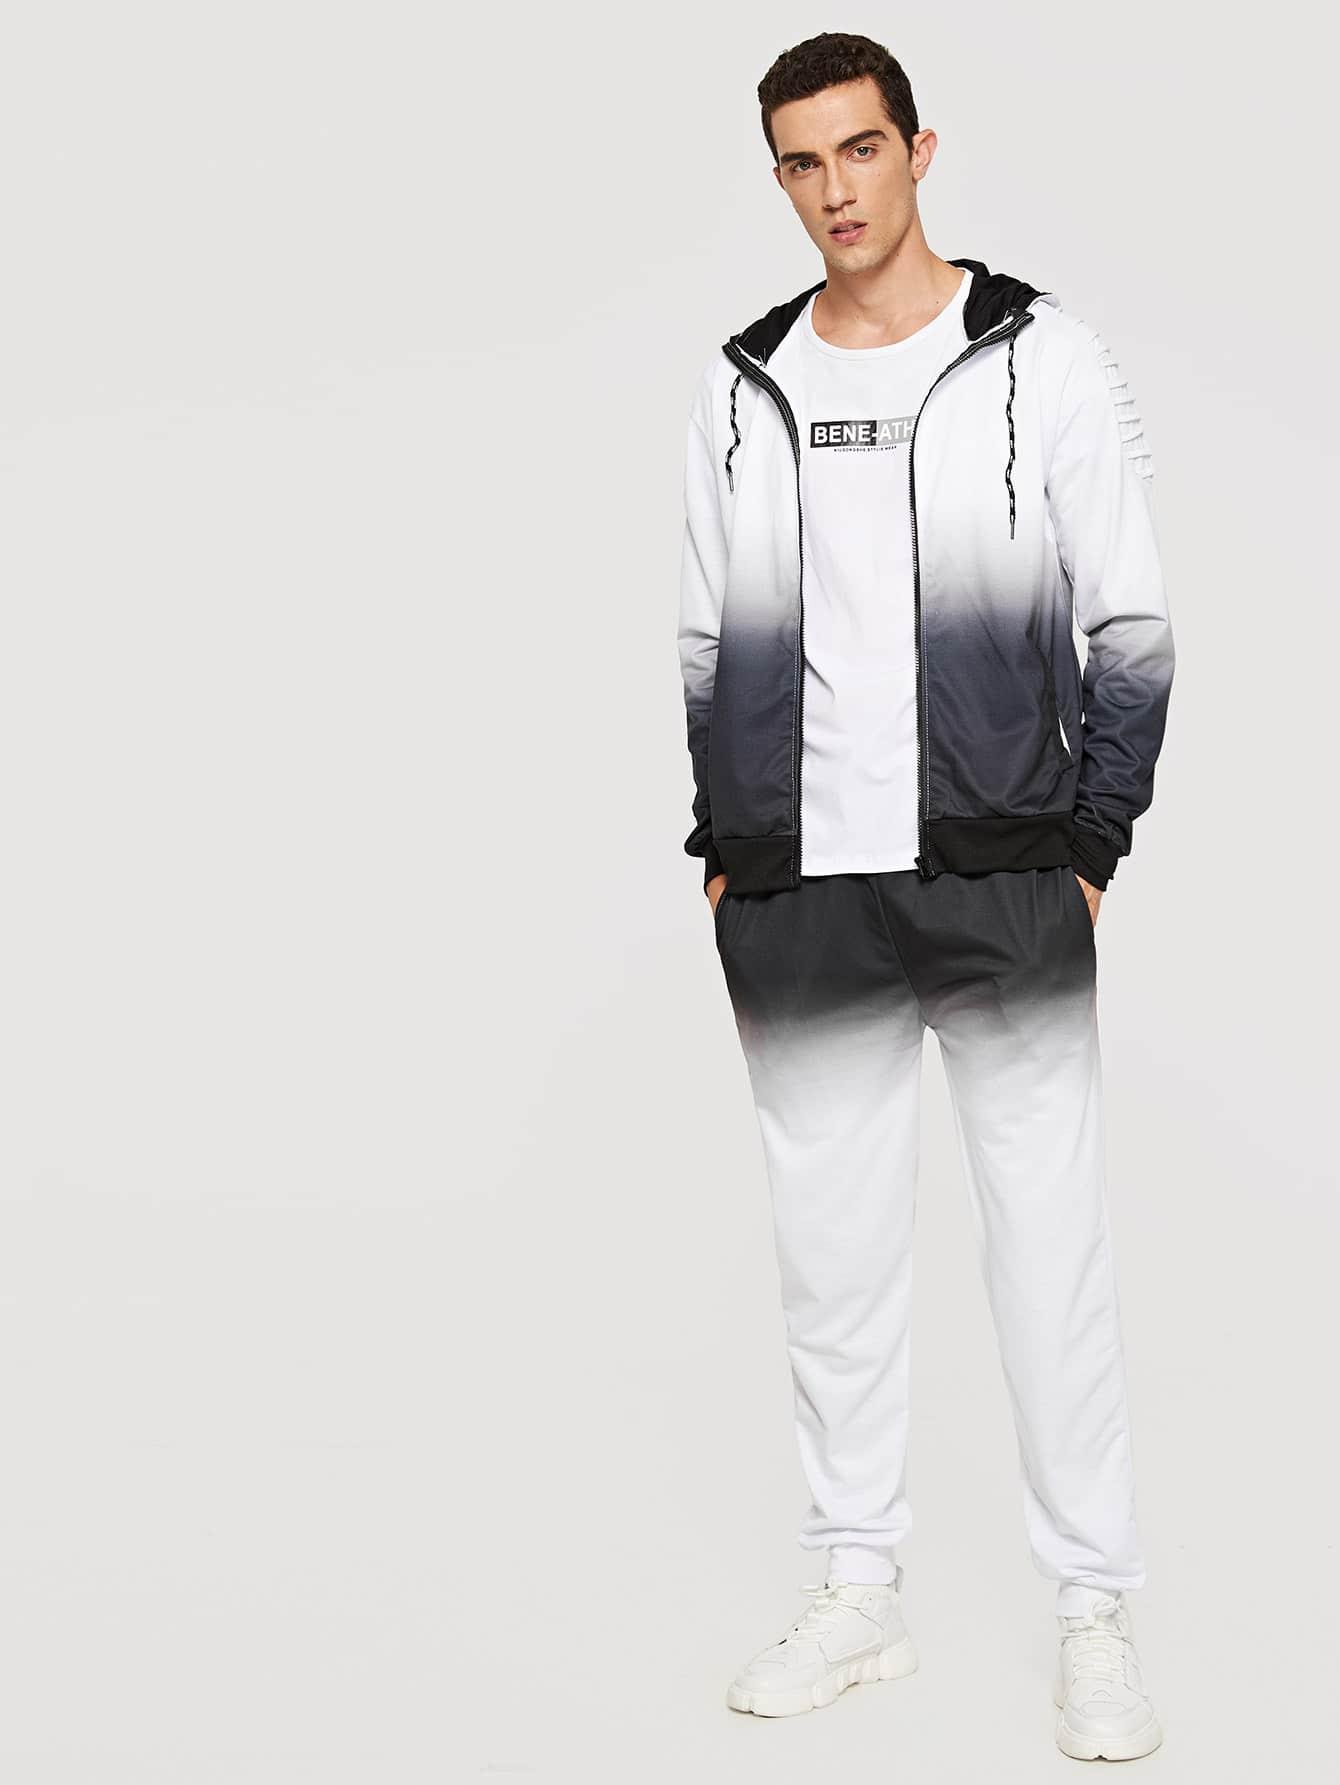 Men Contrast Ombre Hooded Top With Pants Men Contrast Ombre Hooded Top With Pants